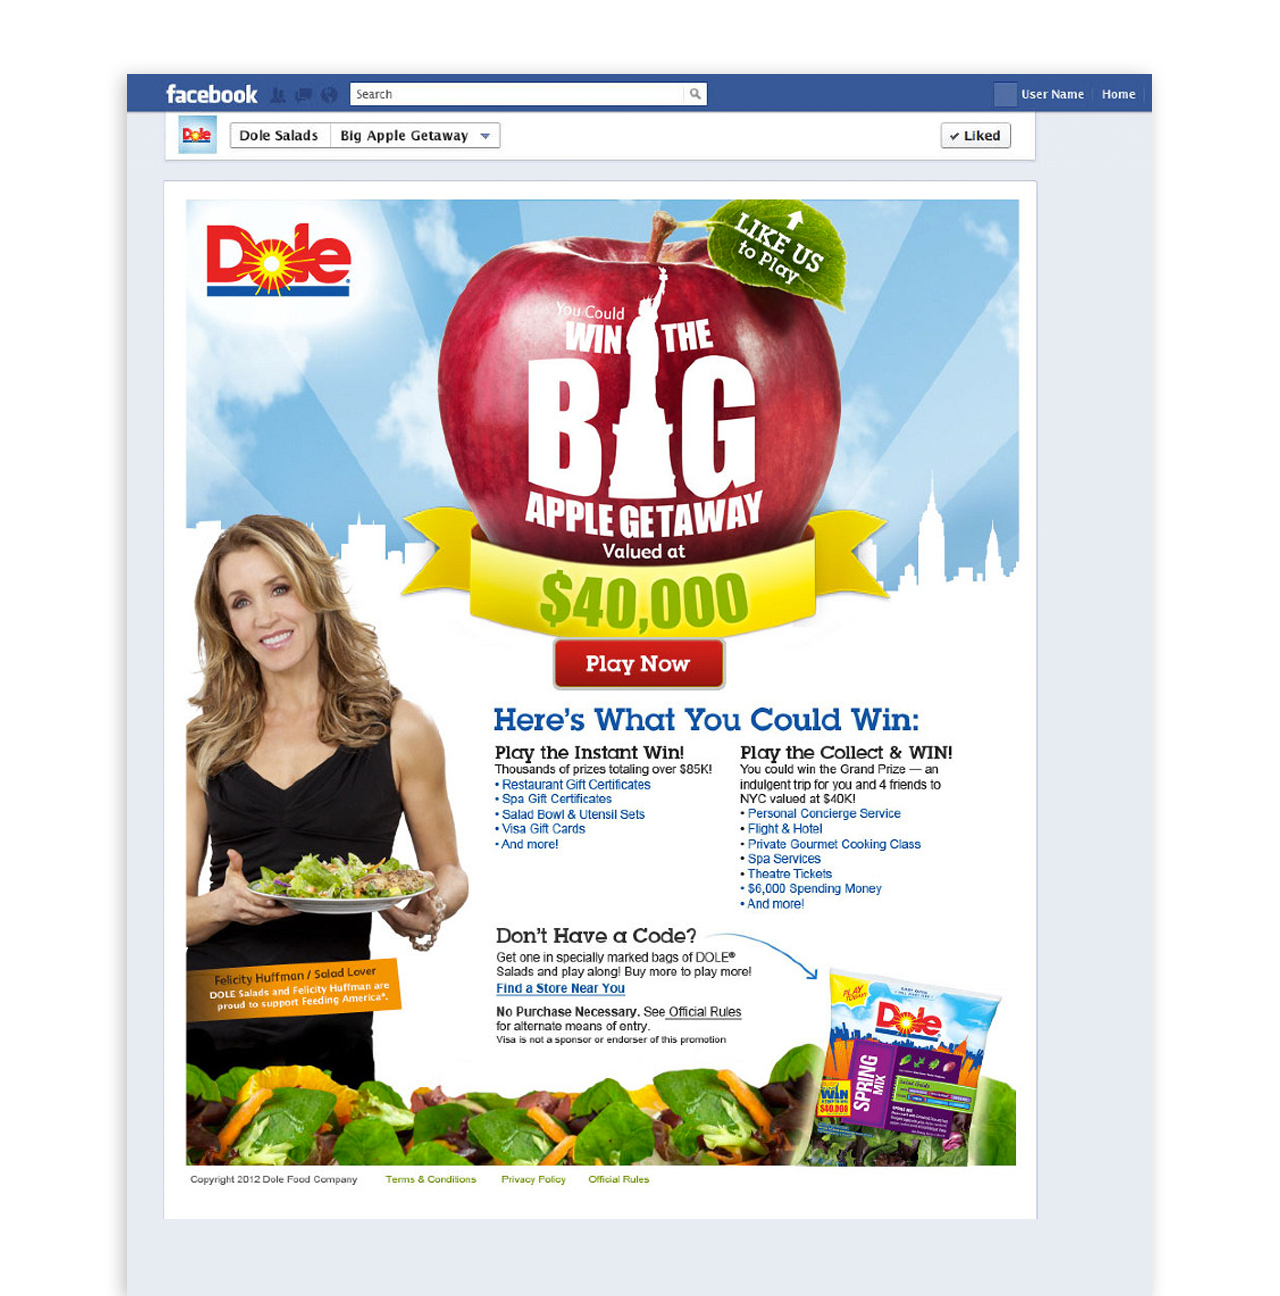 Dole_Facebook1.png